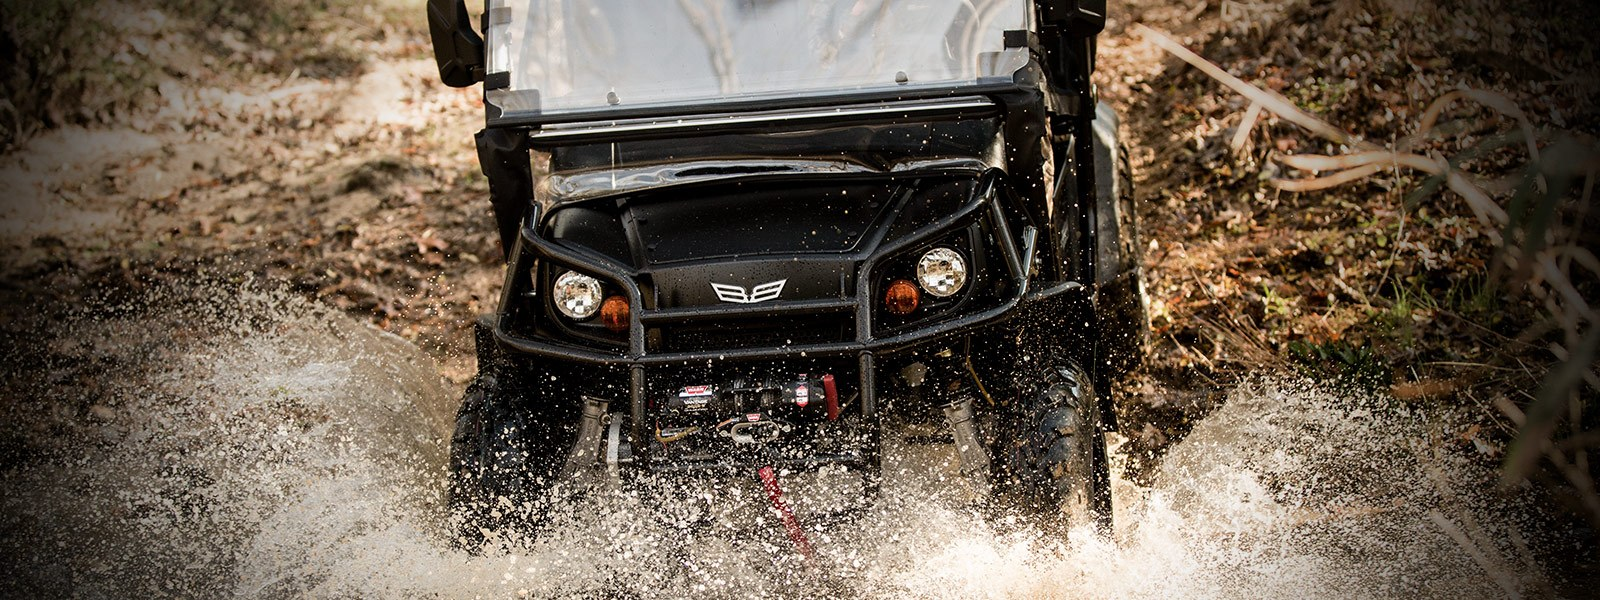 2017 Bad Boy Off Road Ambush iS 4-Passenger in Otsego, Minnesota